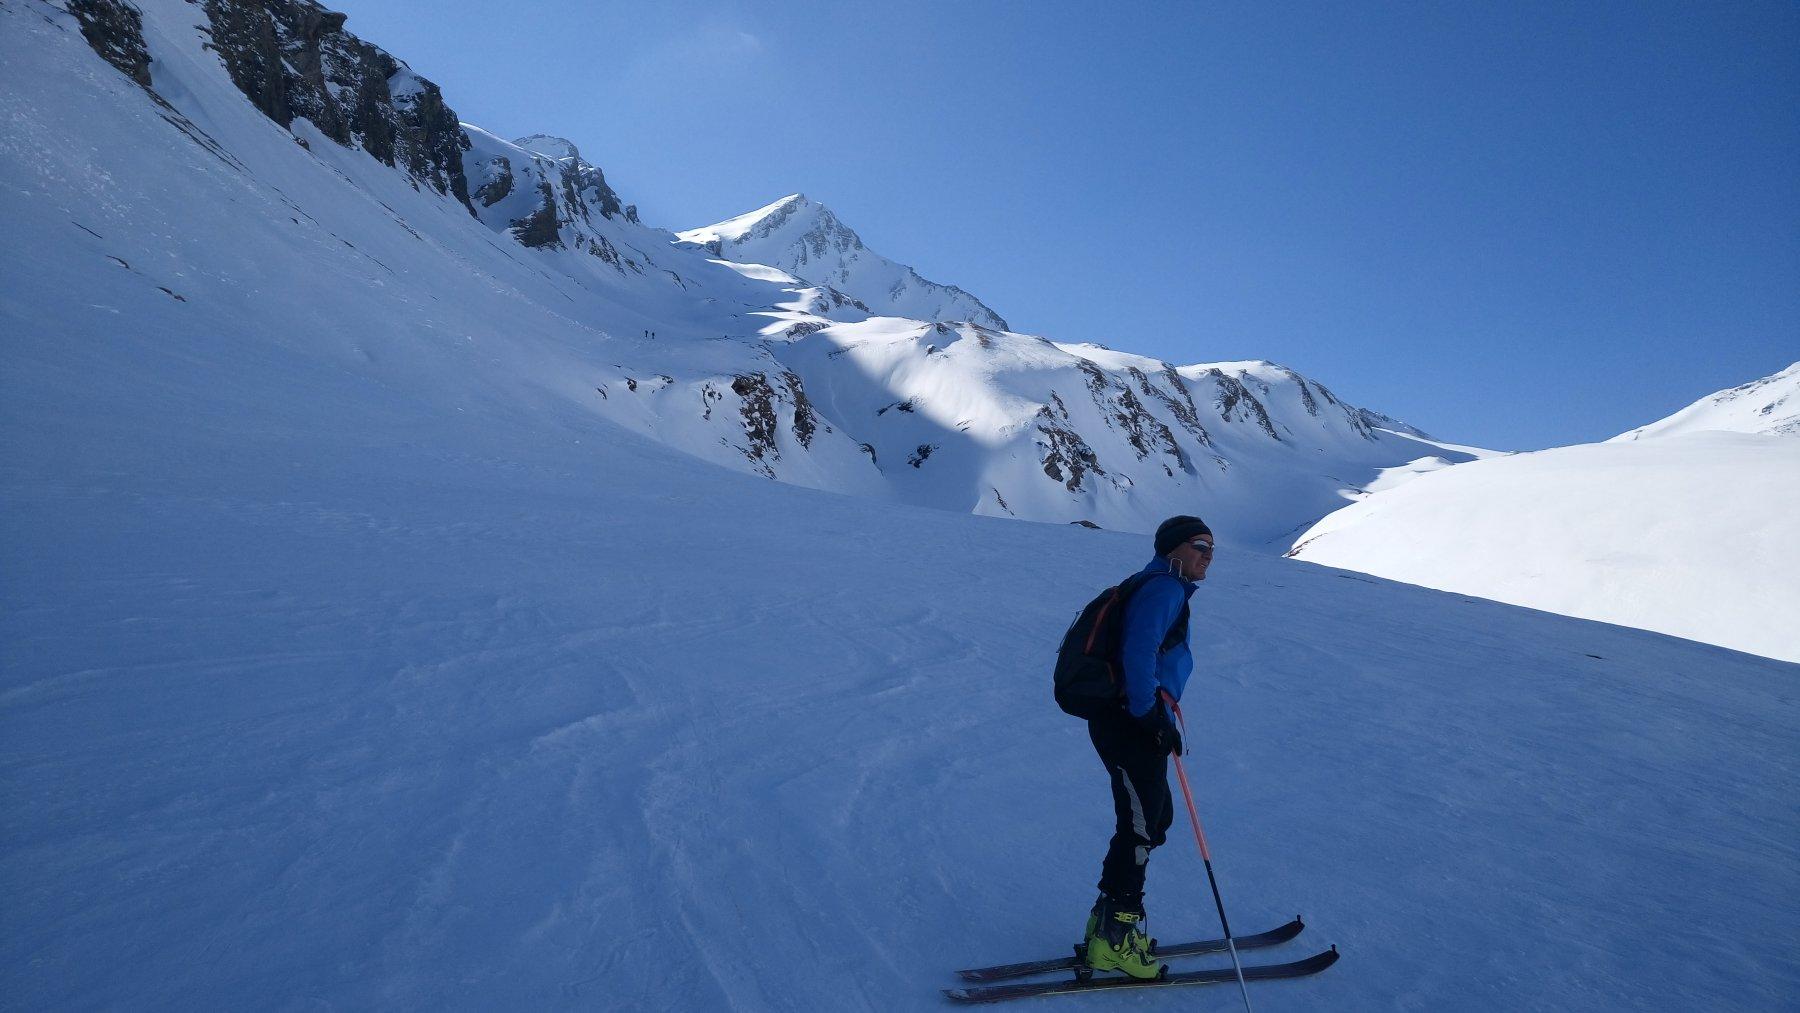 Fulvio a sinistra al sole la nostra cima Gletscherhorn